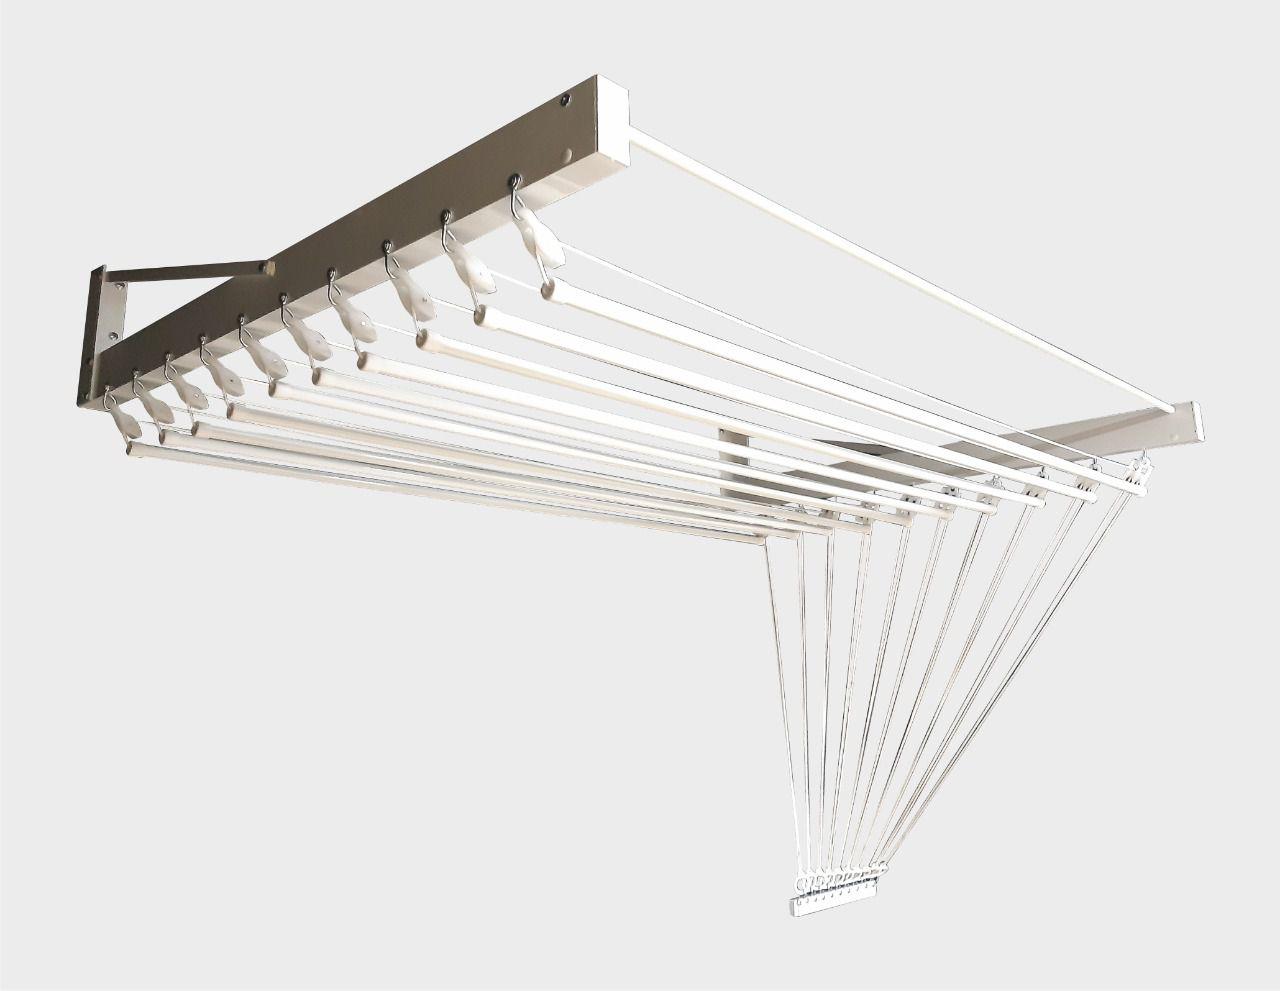 Varal de parede individual 10 varetas branco em alumínio 1,20m - Multivarais